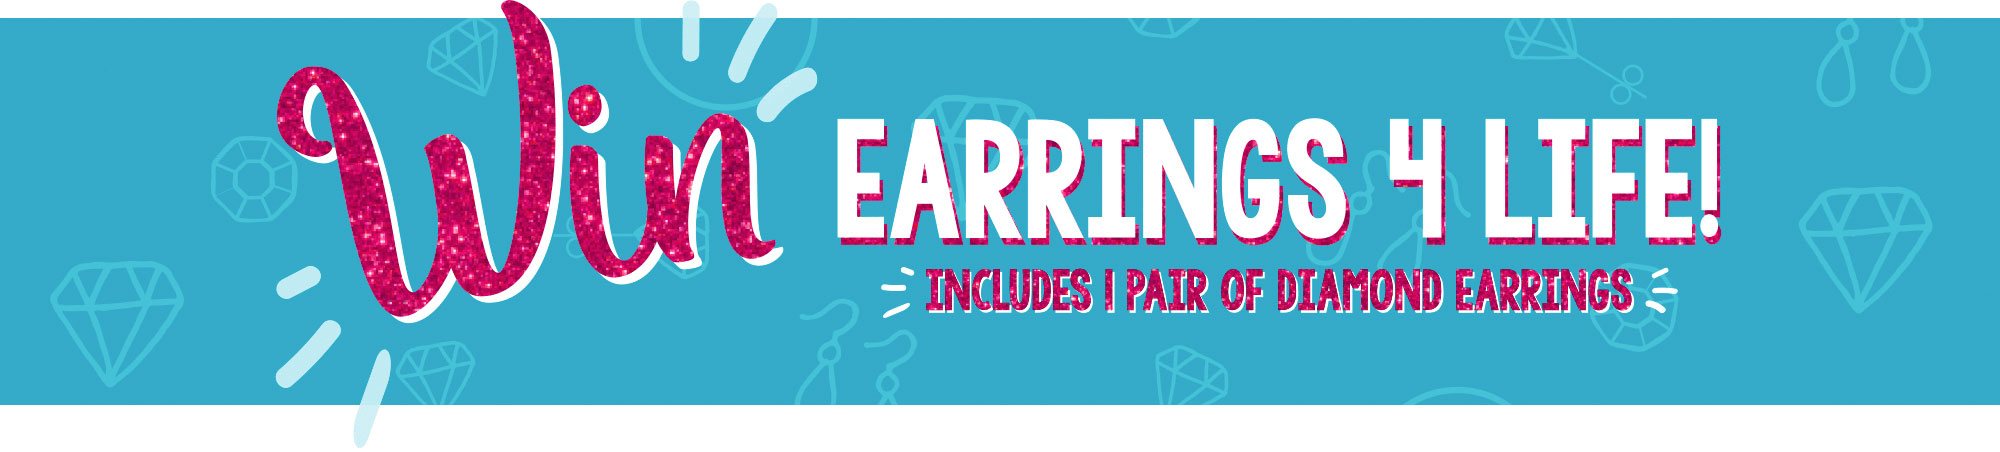 Earrings 4 Life